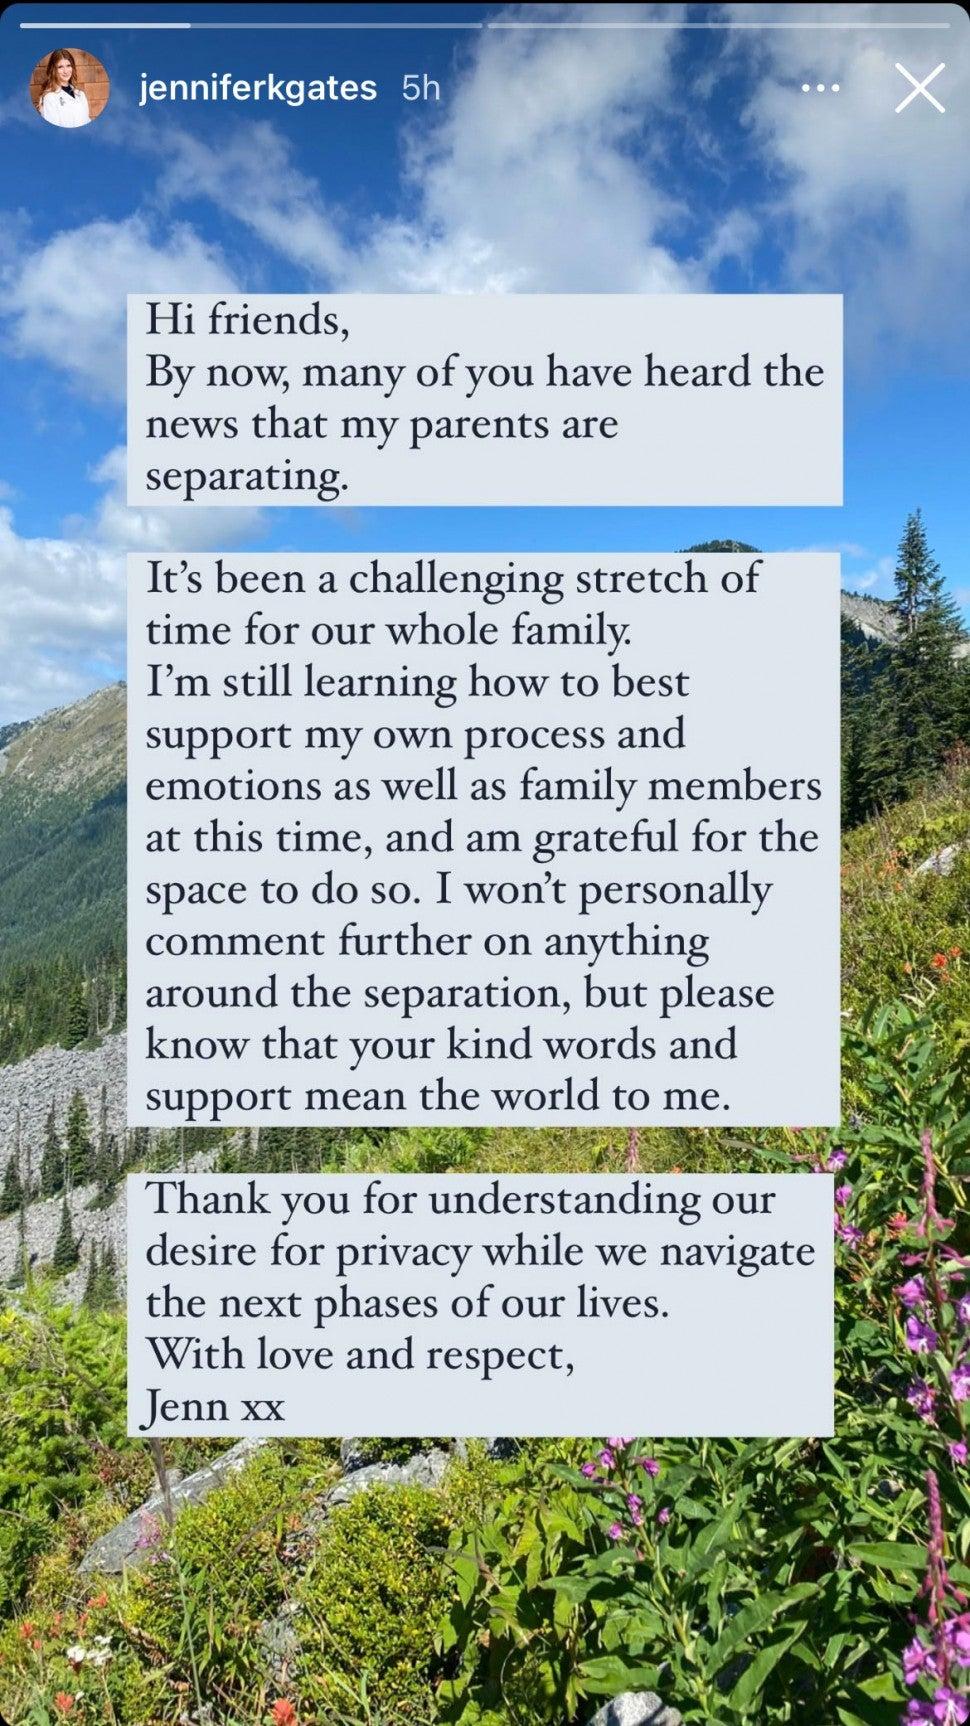 Bill and Melinda Gates 'daughter Jennifer reacts to her parents' divorce